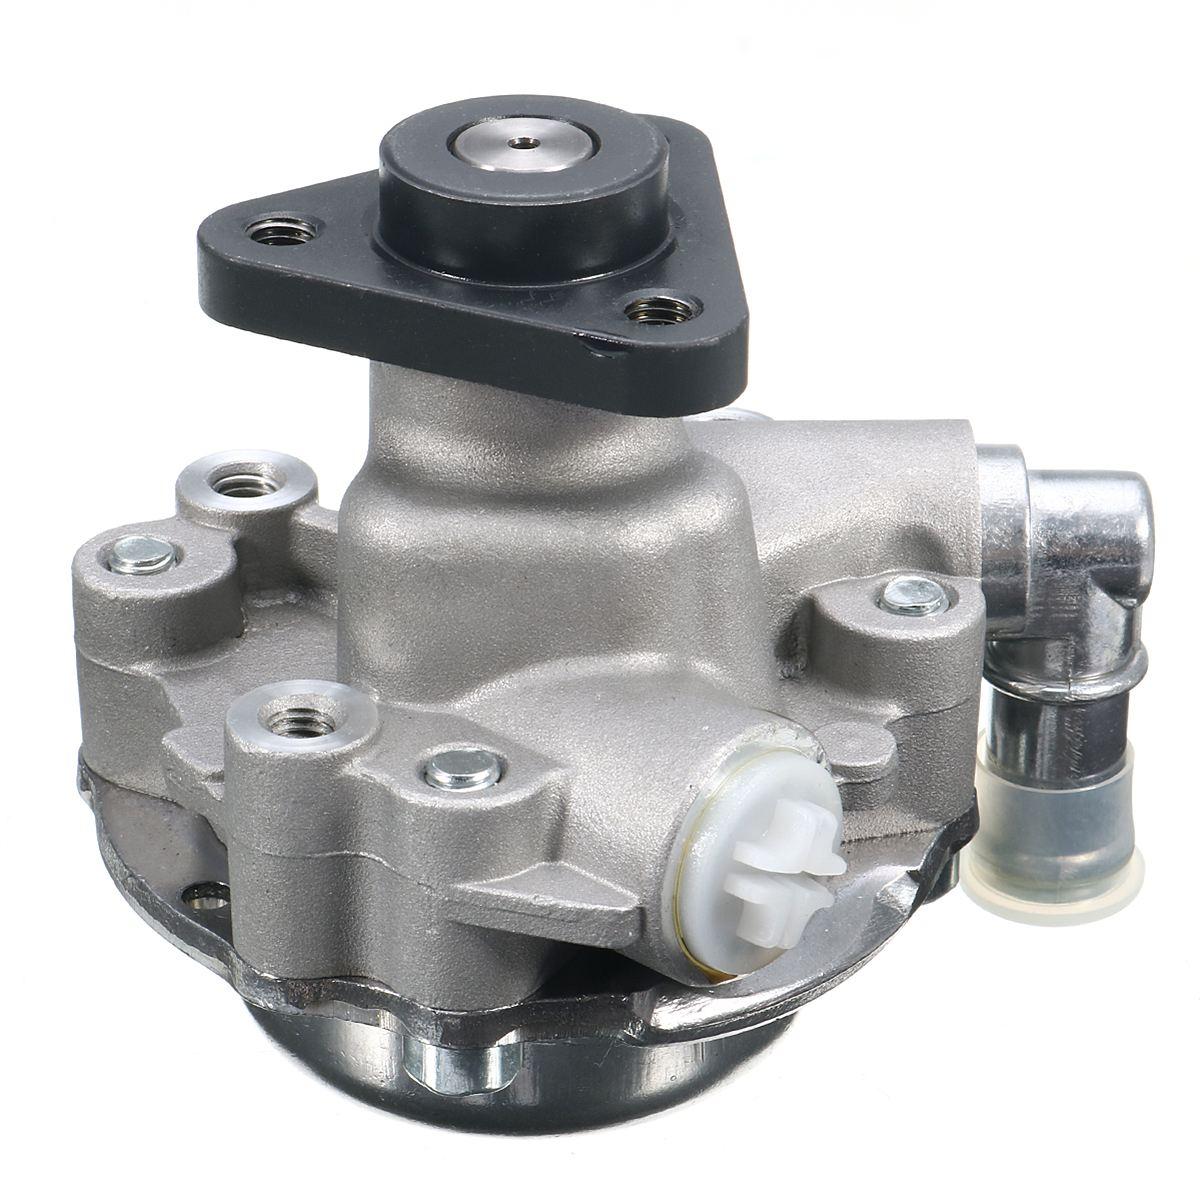 Aluminum Power Steering Pump Engine For BMW E46 323Ci 323i 325Ci 325i 328Ci 328i 330Ci 330i 3.0L 2002 2003 2004 2005 2006 new power steering pump for bmw 325ci 325xi 330ci 330i 330xi 2 5l 3 0l dohc